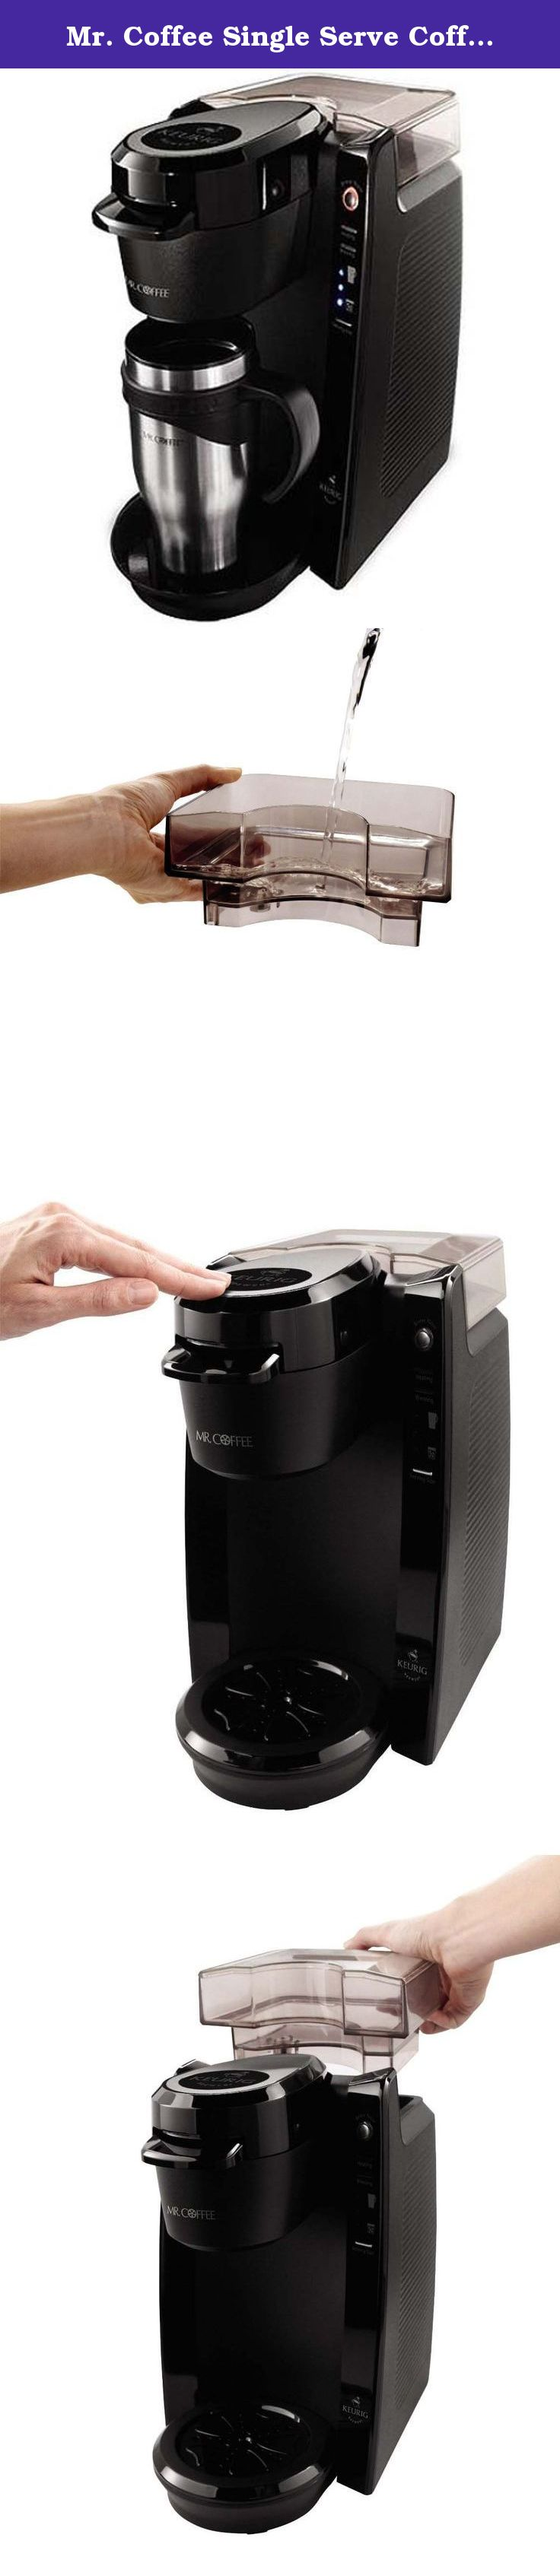 Mr. Coffee Single Serve Coffee Brewer BVMCKG5001, 24